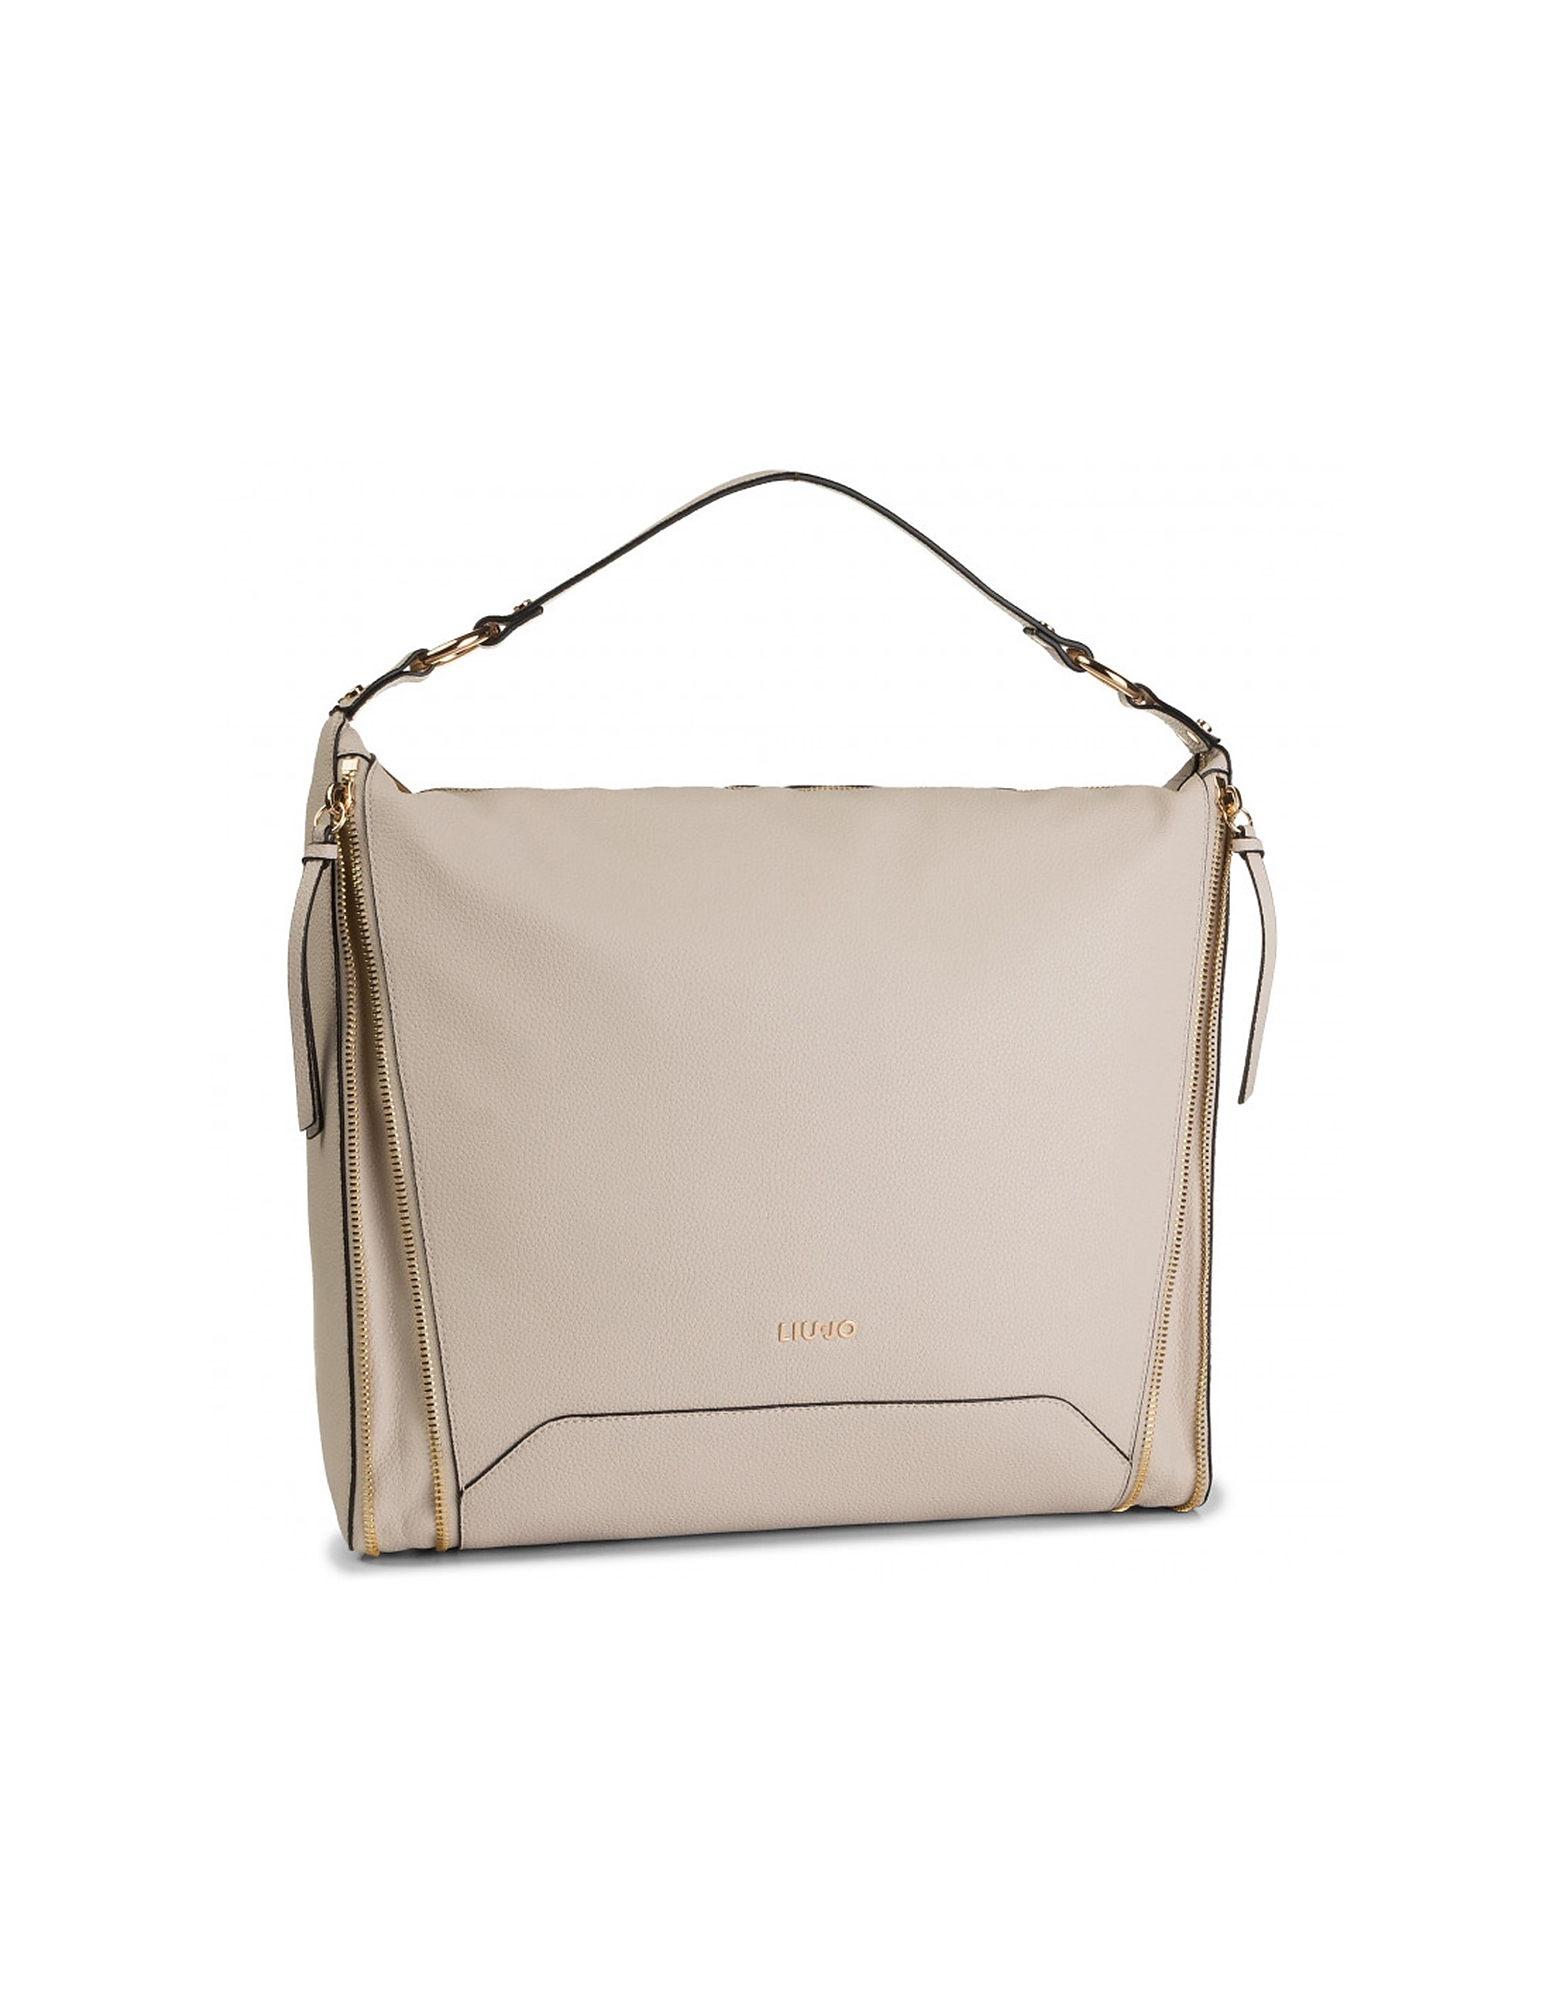 Liu Jo Designer Handbags, Women's White Bag